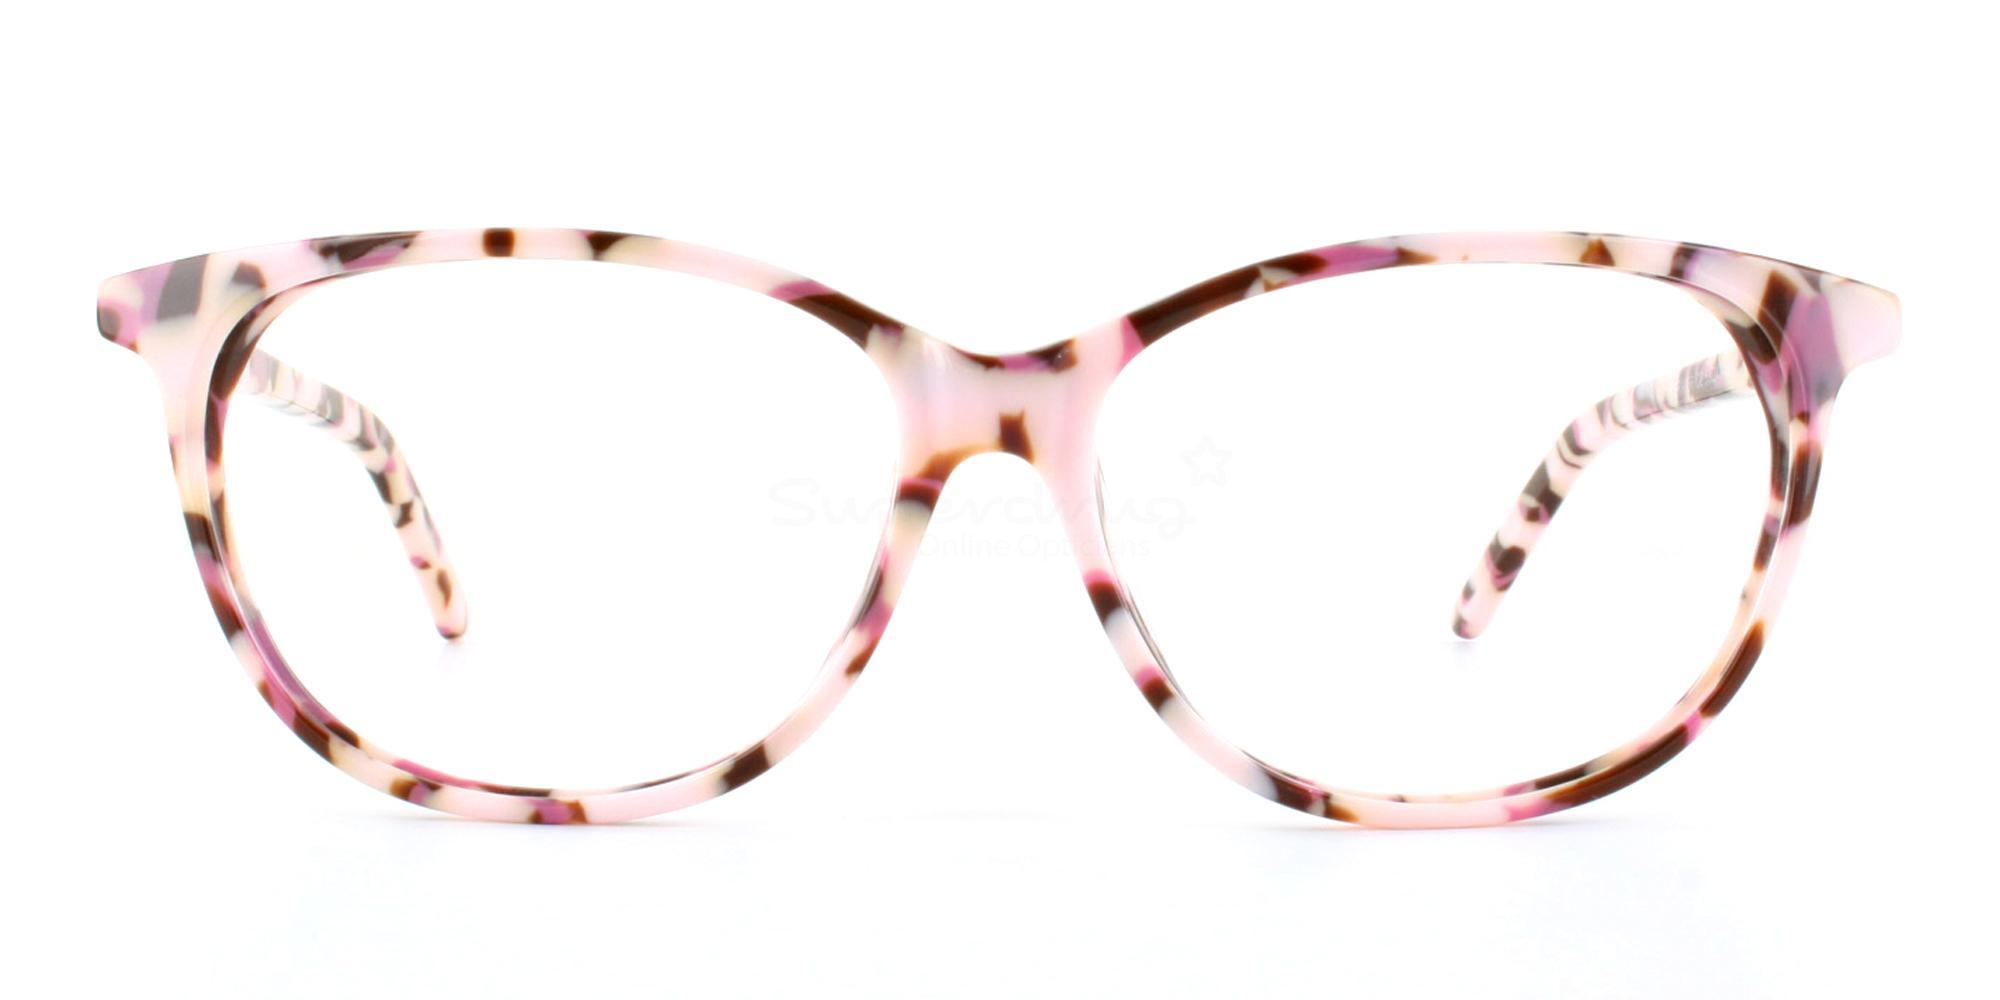 C2 SRA156 Glasses, Neon